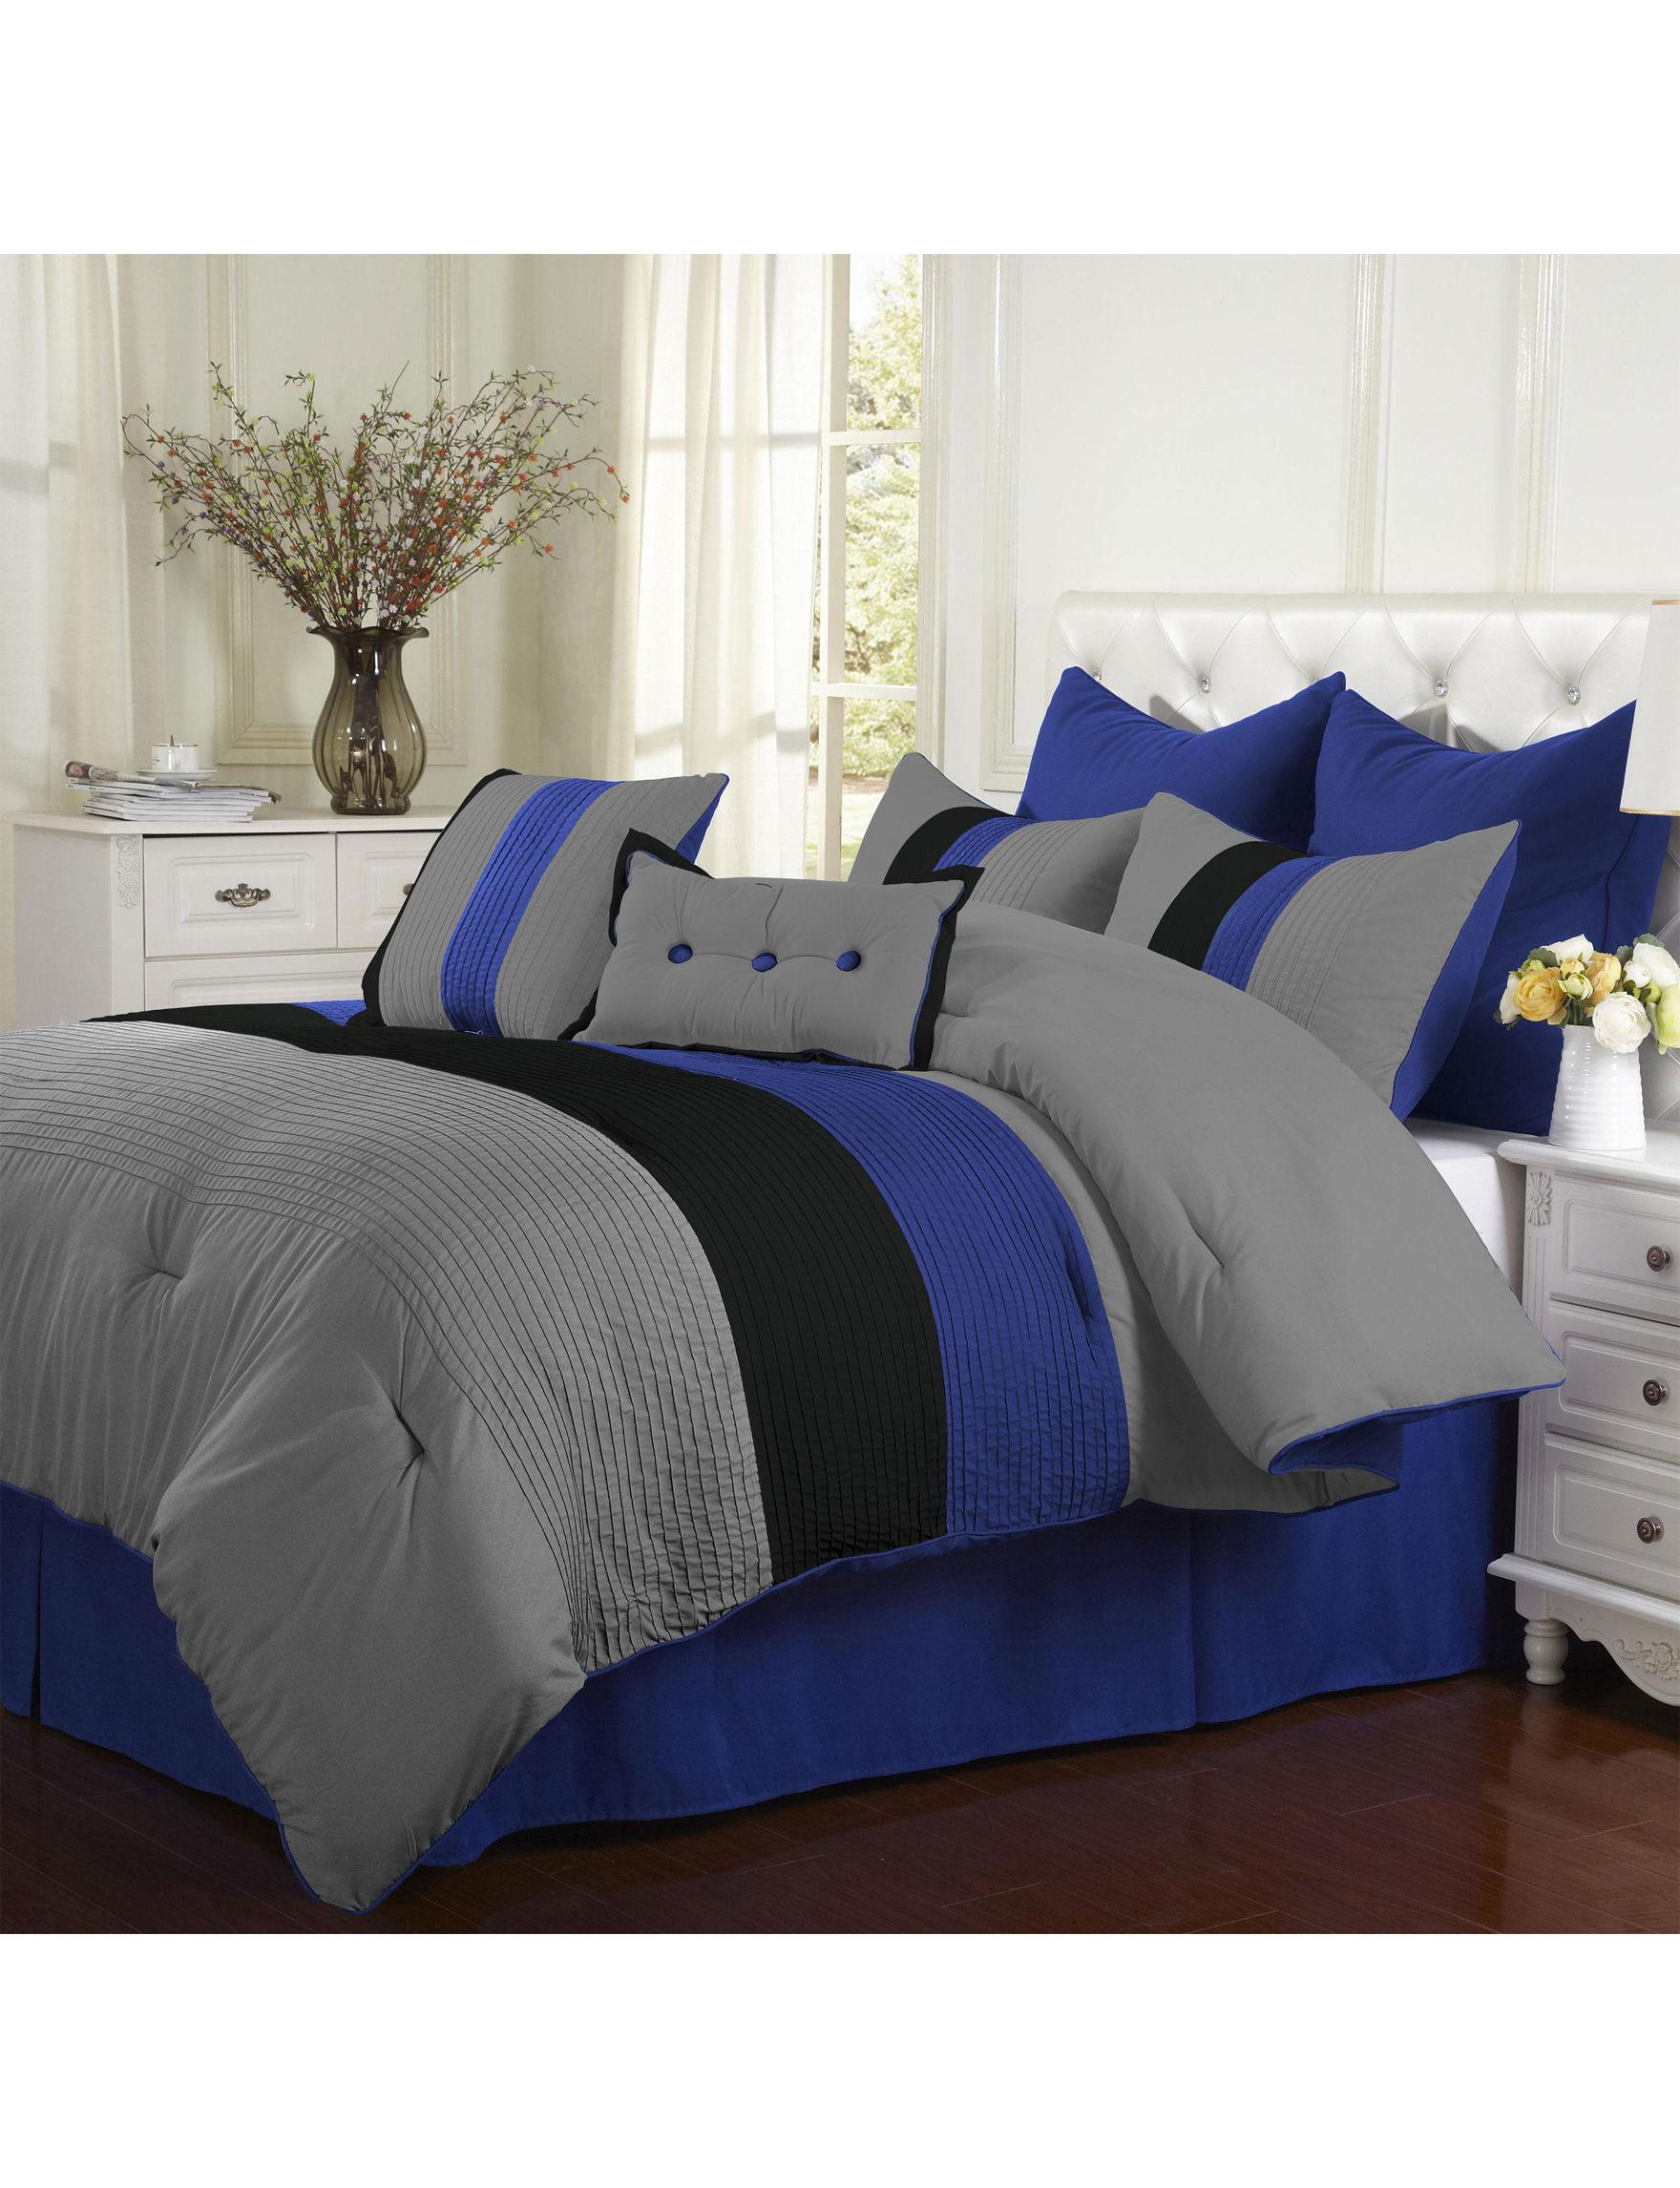 Superior Blue Comforters & Comforter Sets